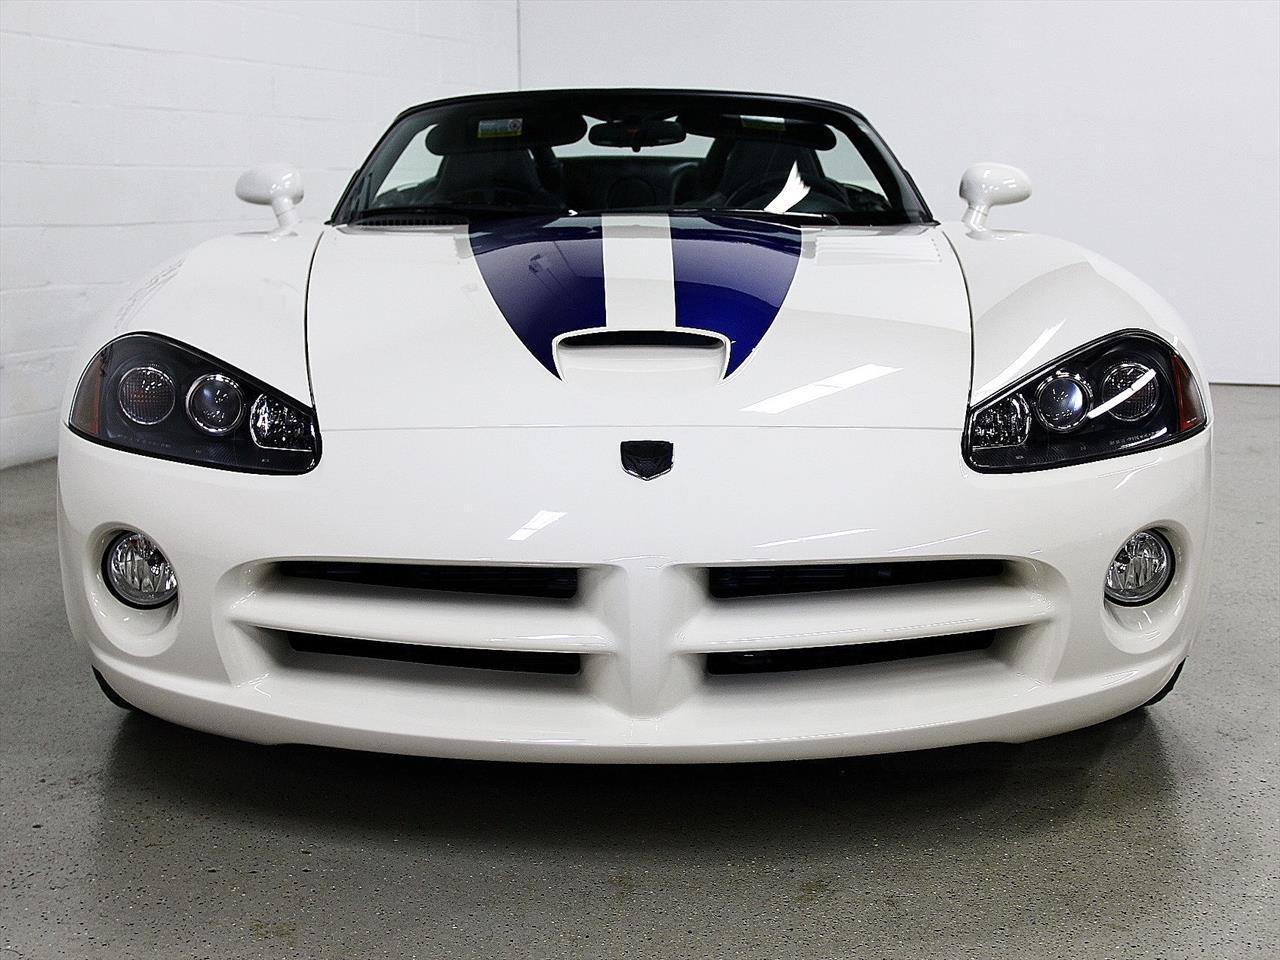 2005 Dodge Viper SRT 10 Convertible Commemorative Edition